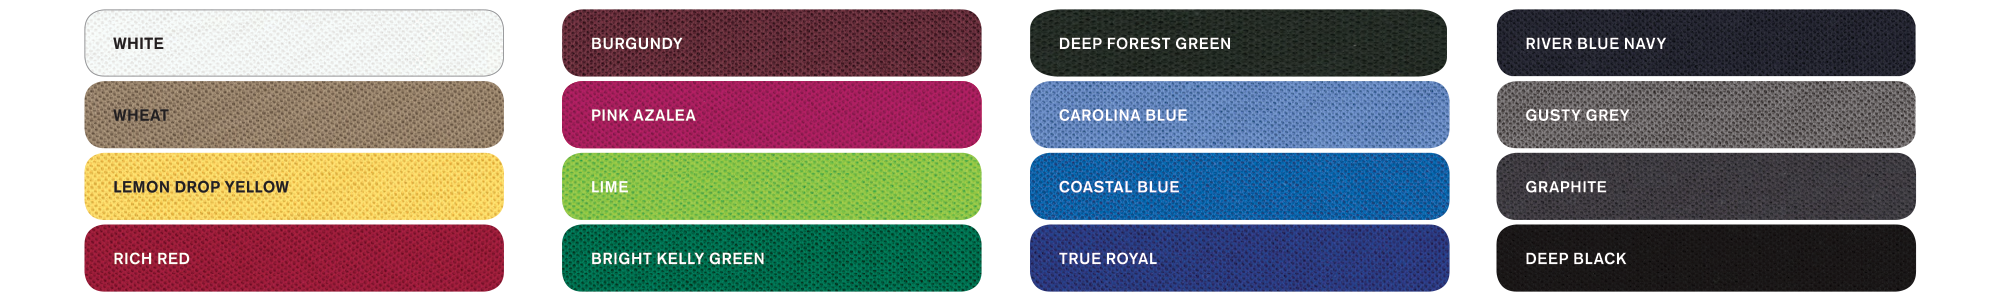 core classic pique polo colors